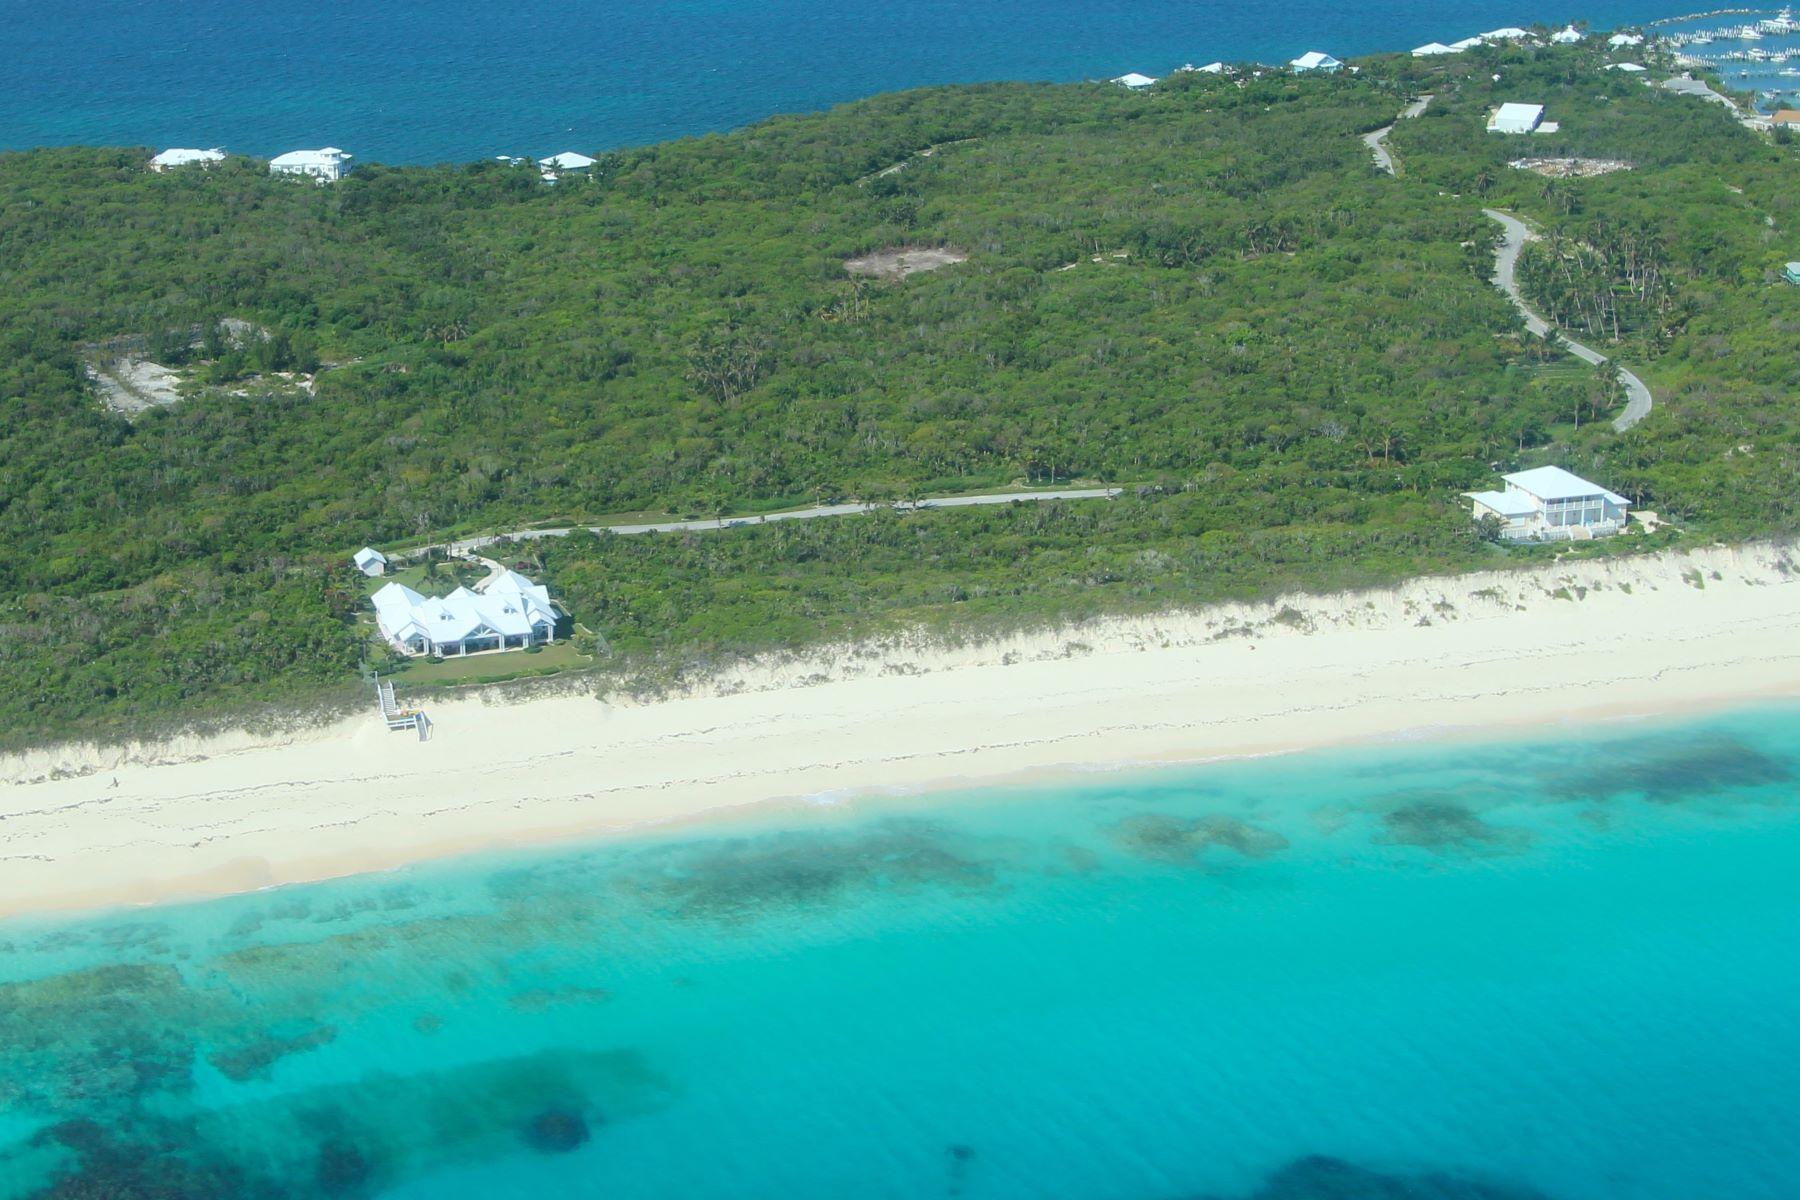 Terreno per Vendita alle ore Lot 7 Orchid Bay Orchid Bay, Guana Cay, Abaco Bahamas